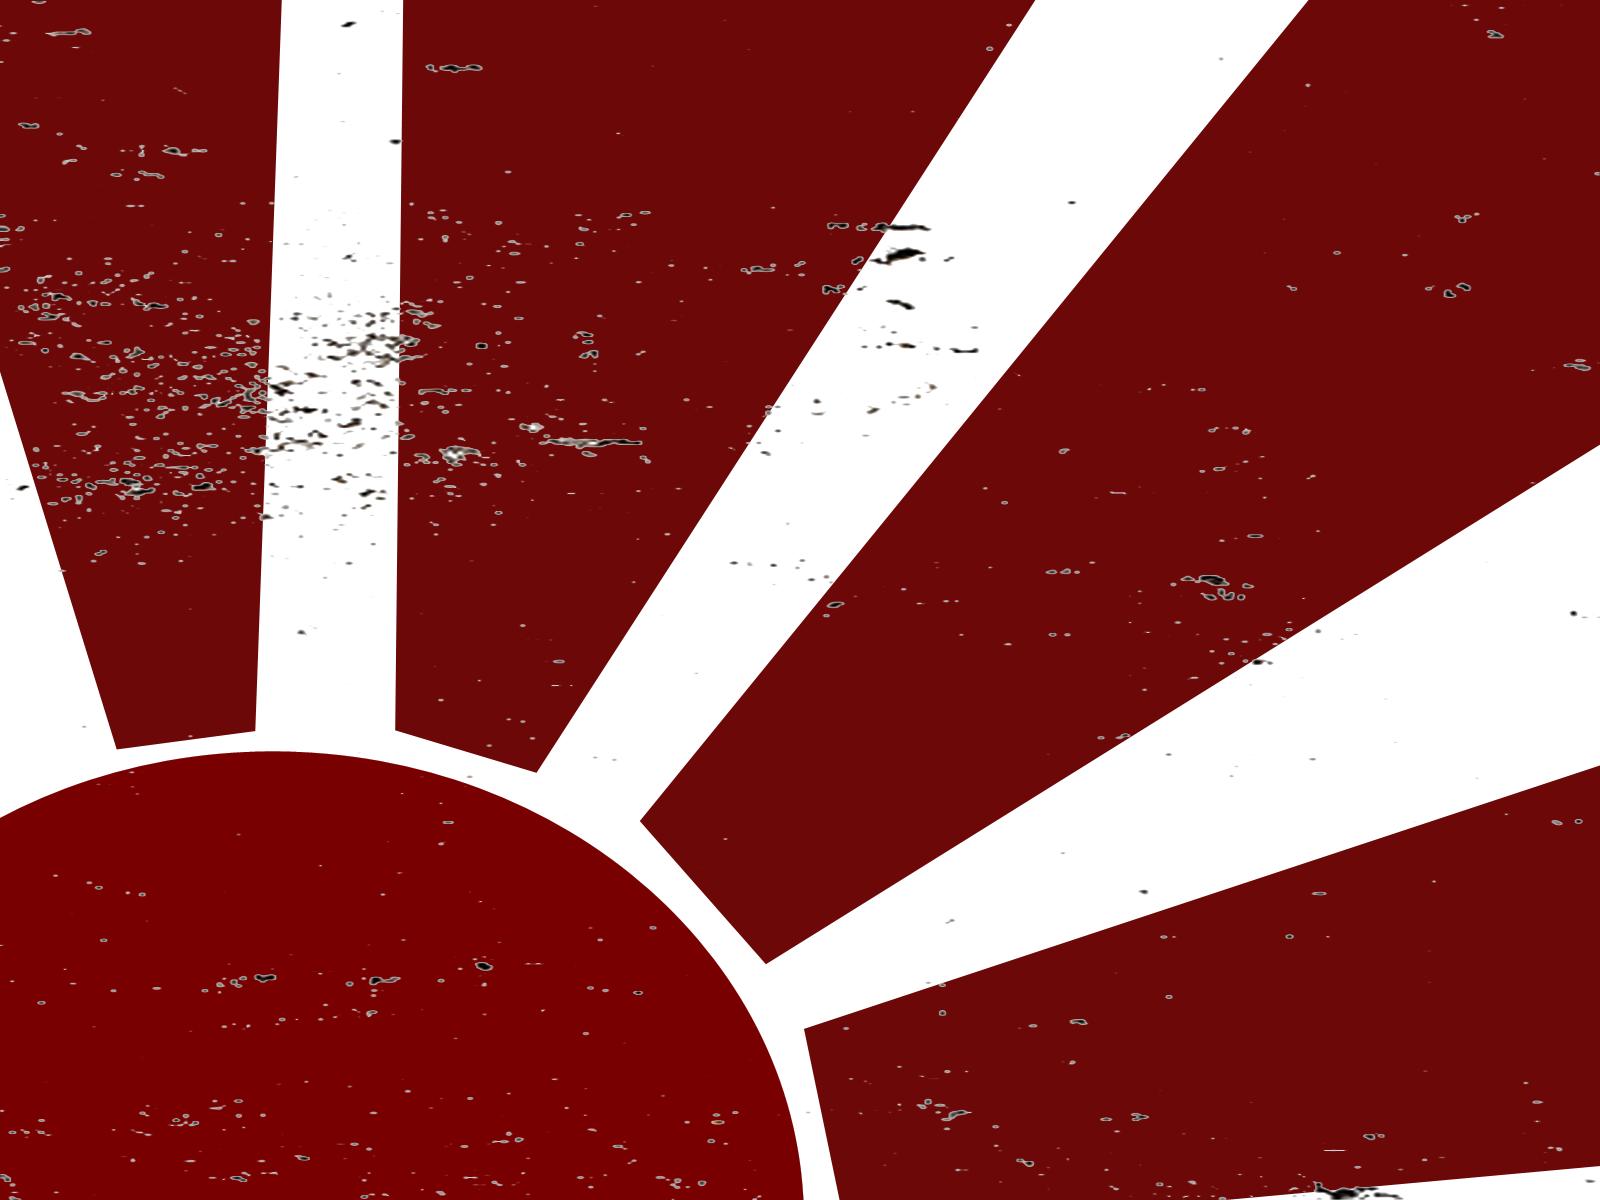 Imperial japan flag by robdog312 on deviantart imperial japan flag by robdog312 imperial japan flag by robdog312 voltagebd Gallery